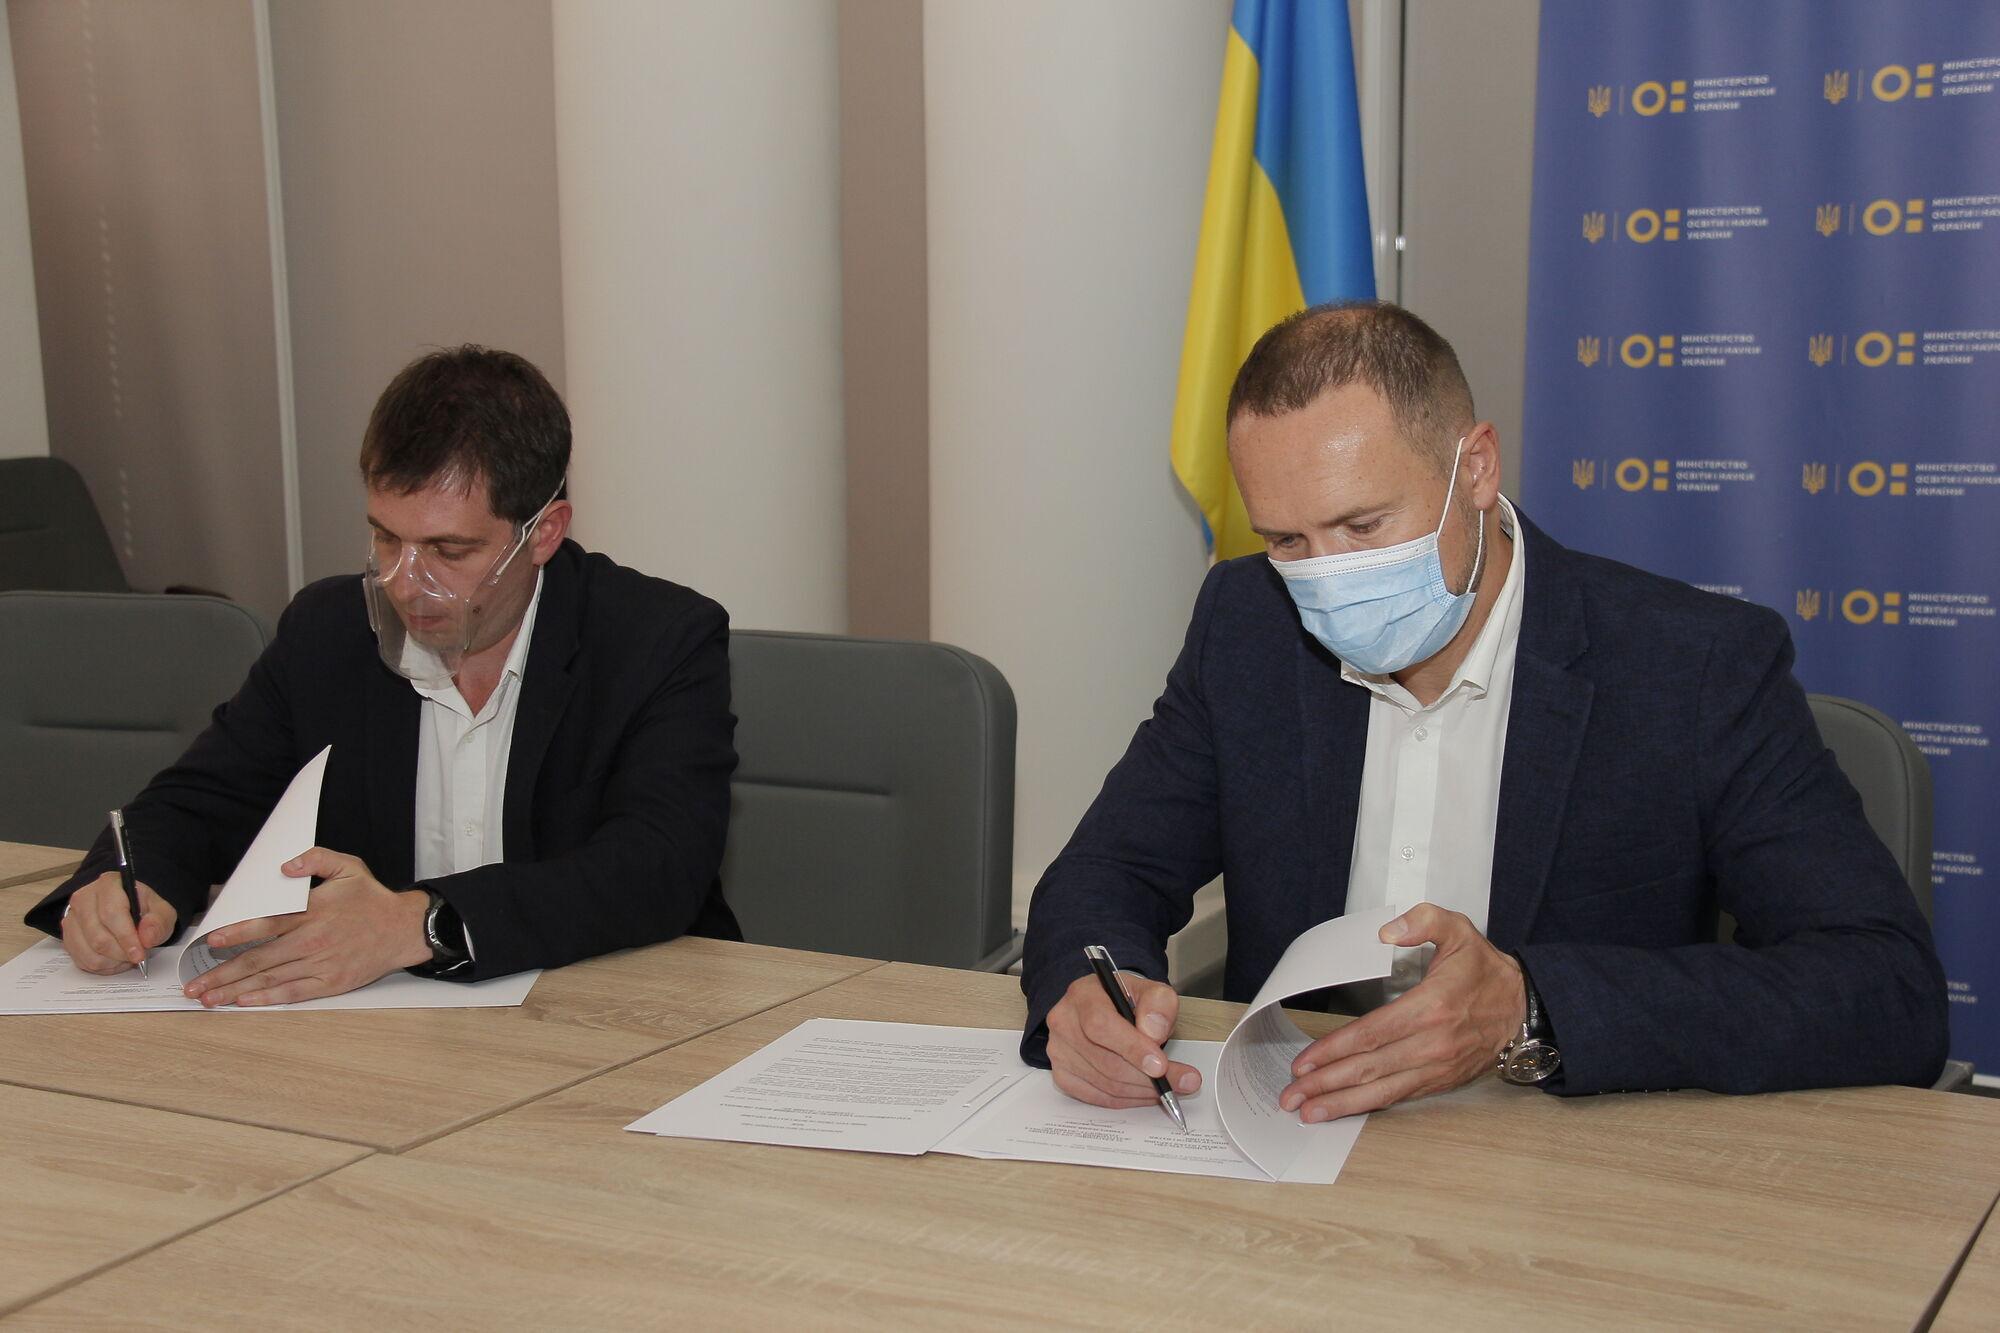 Документ подписали Сергей Шкарлет и Макс Яковер